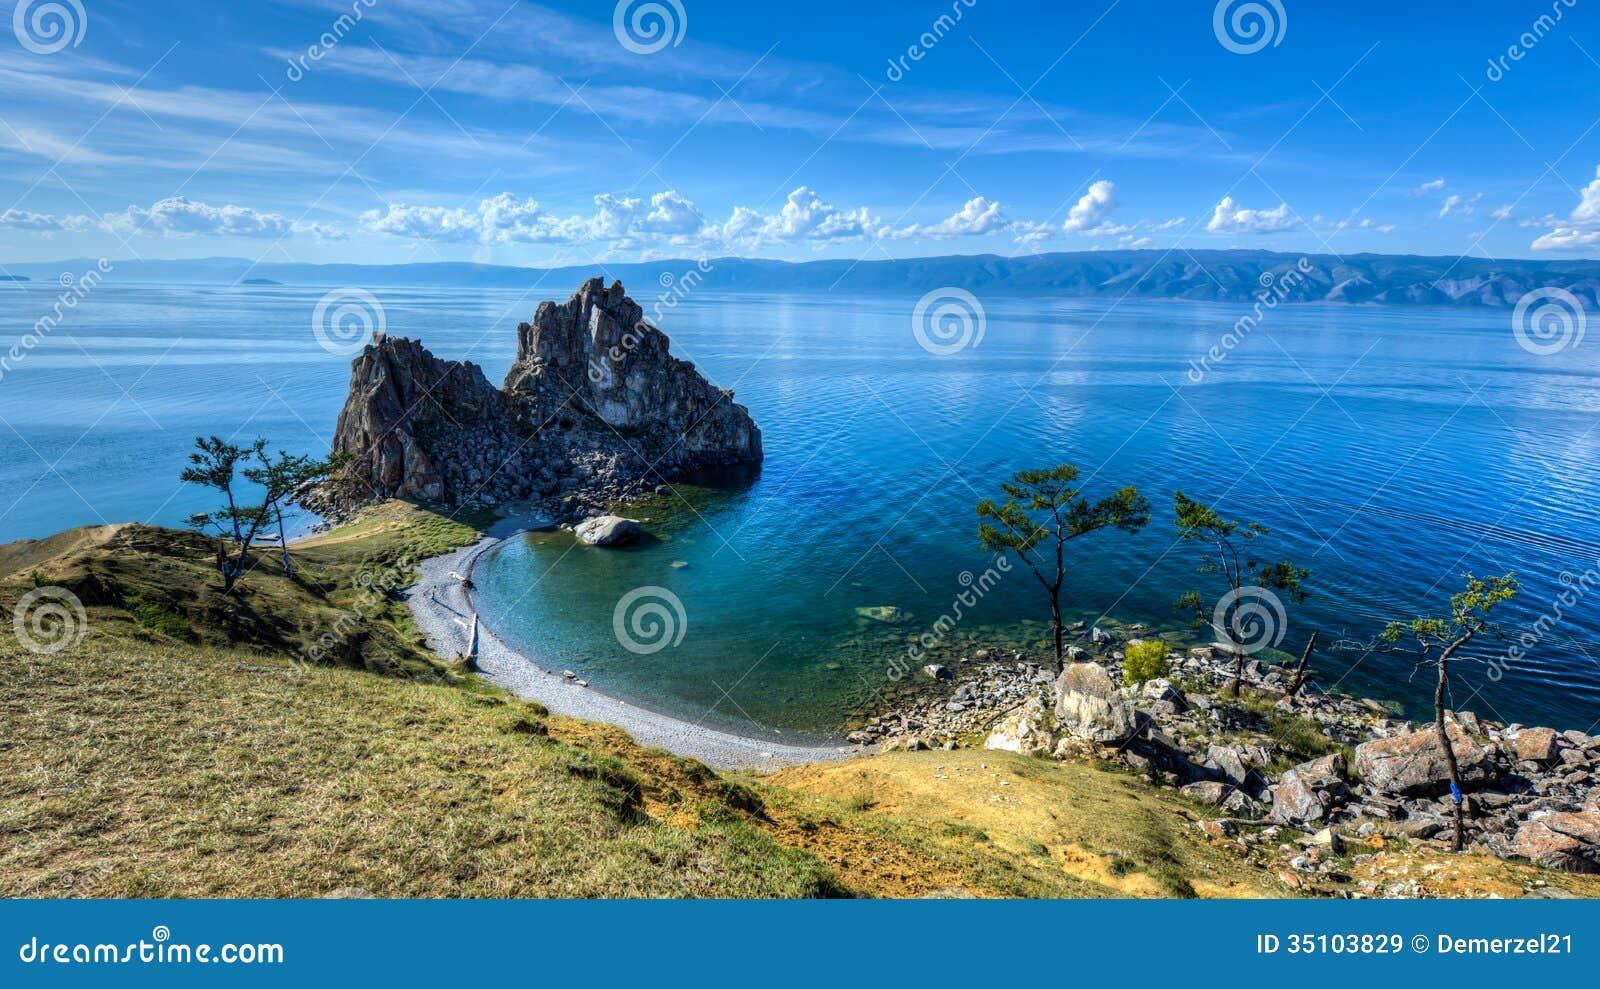 Morocco Design Shaman Rock Island Of Olkhon Lake Baikal Russia Royalty